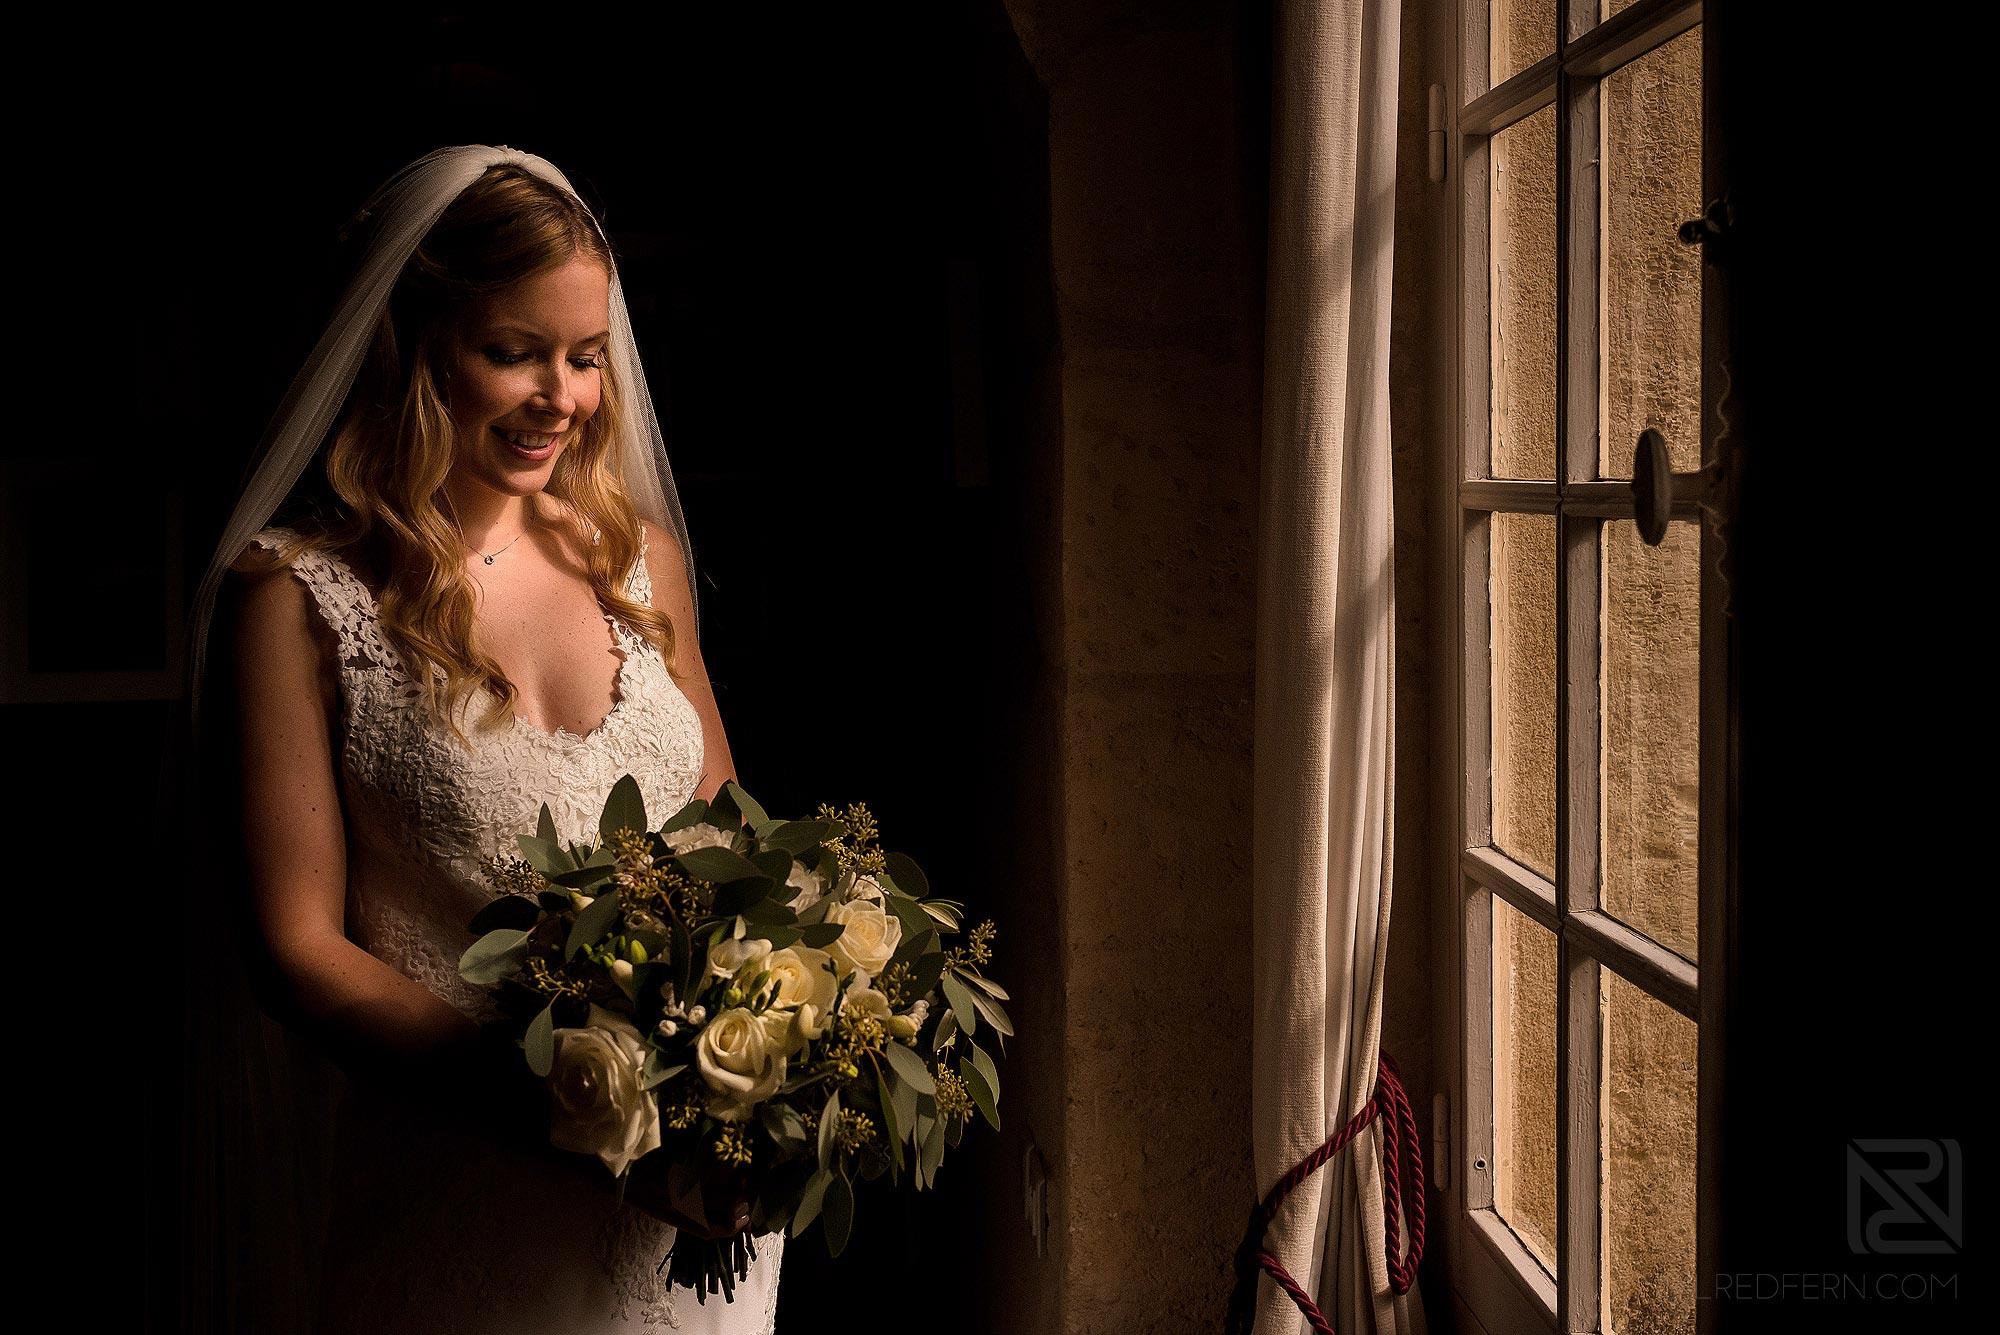 window light portrait of bride